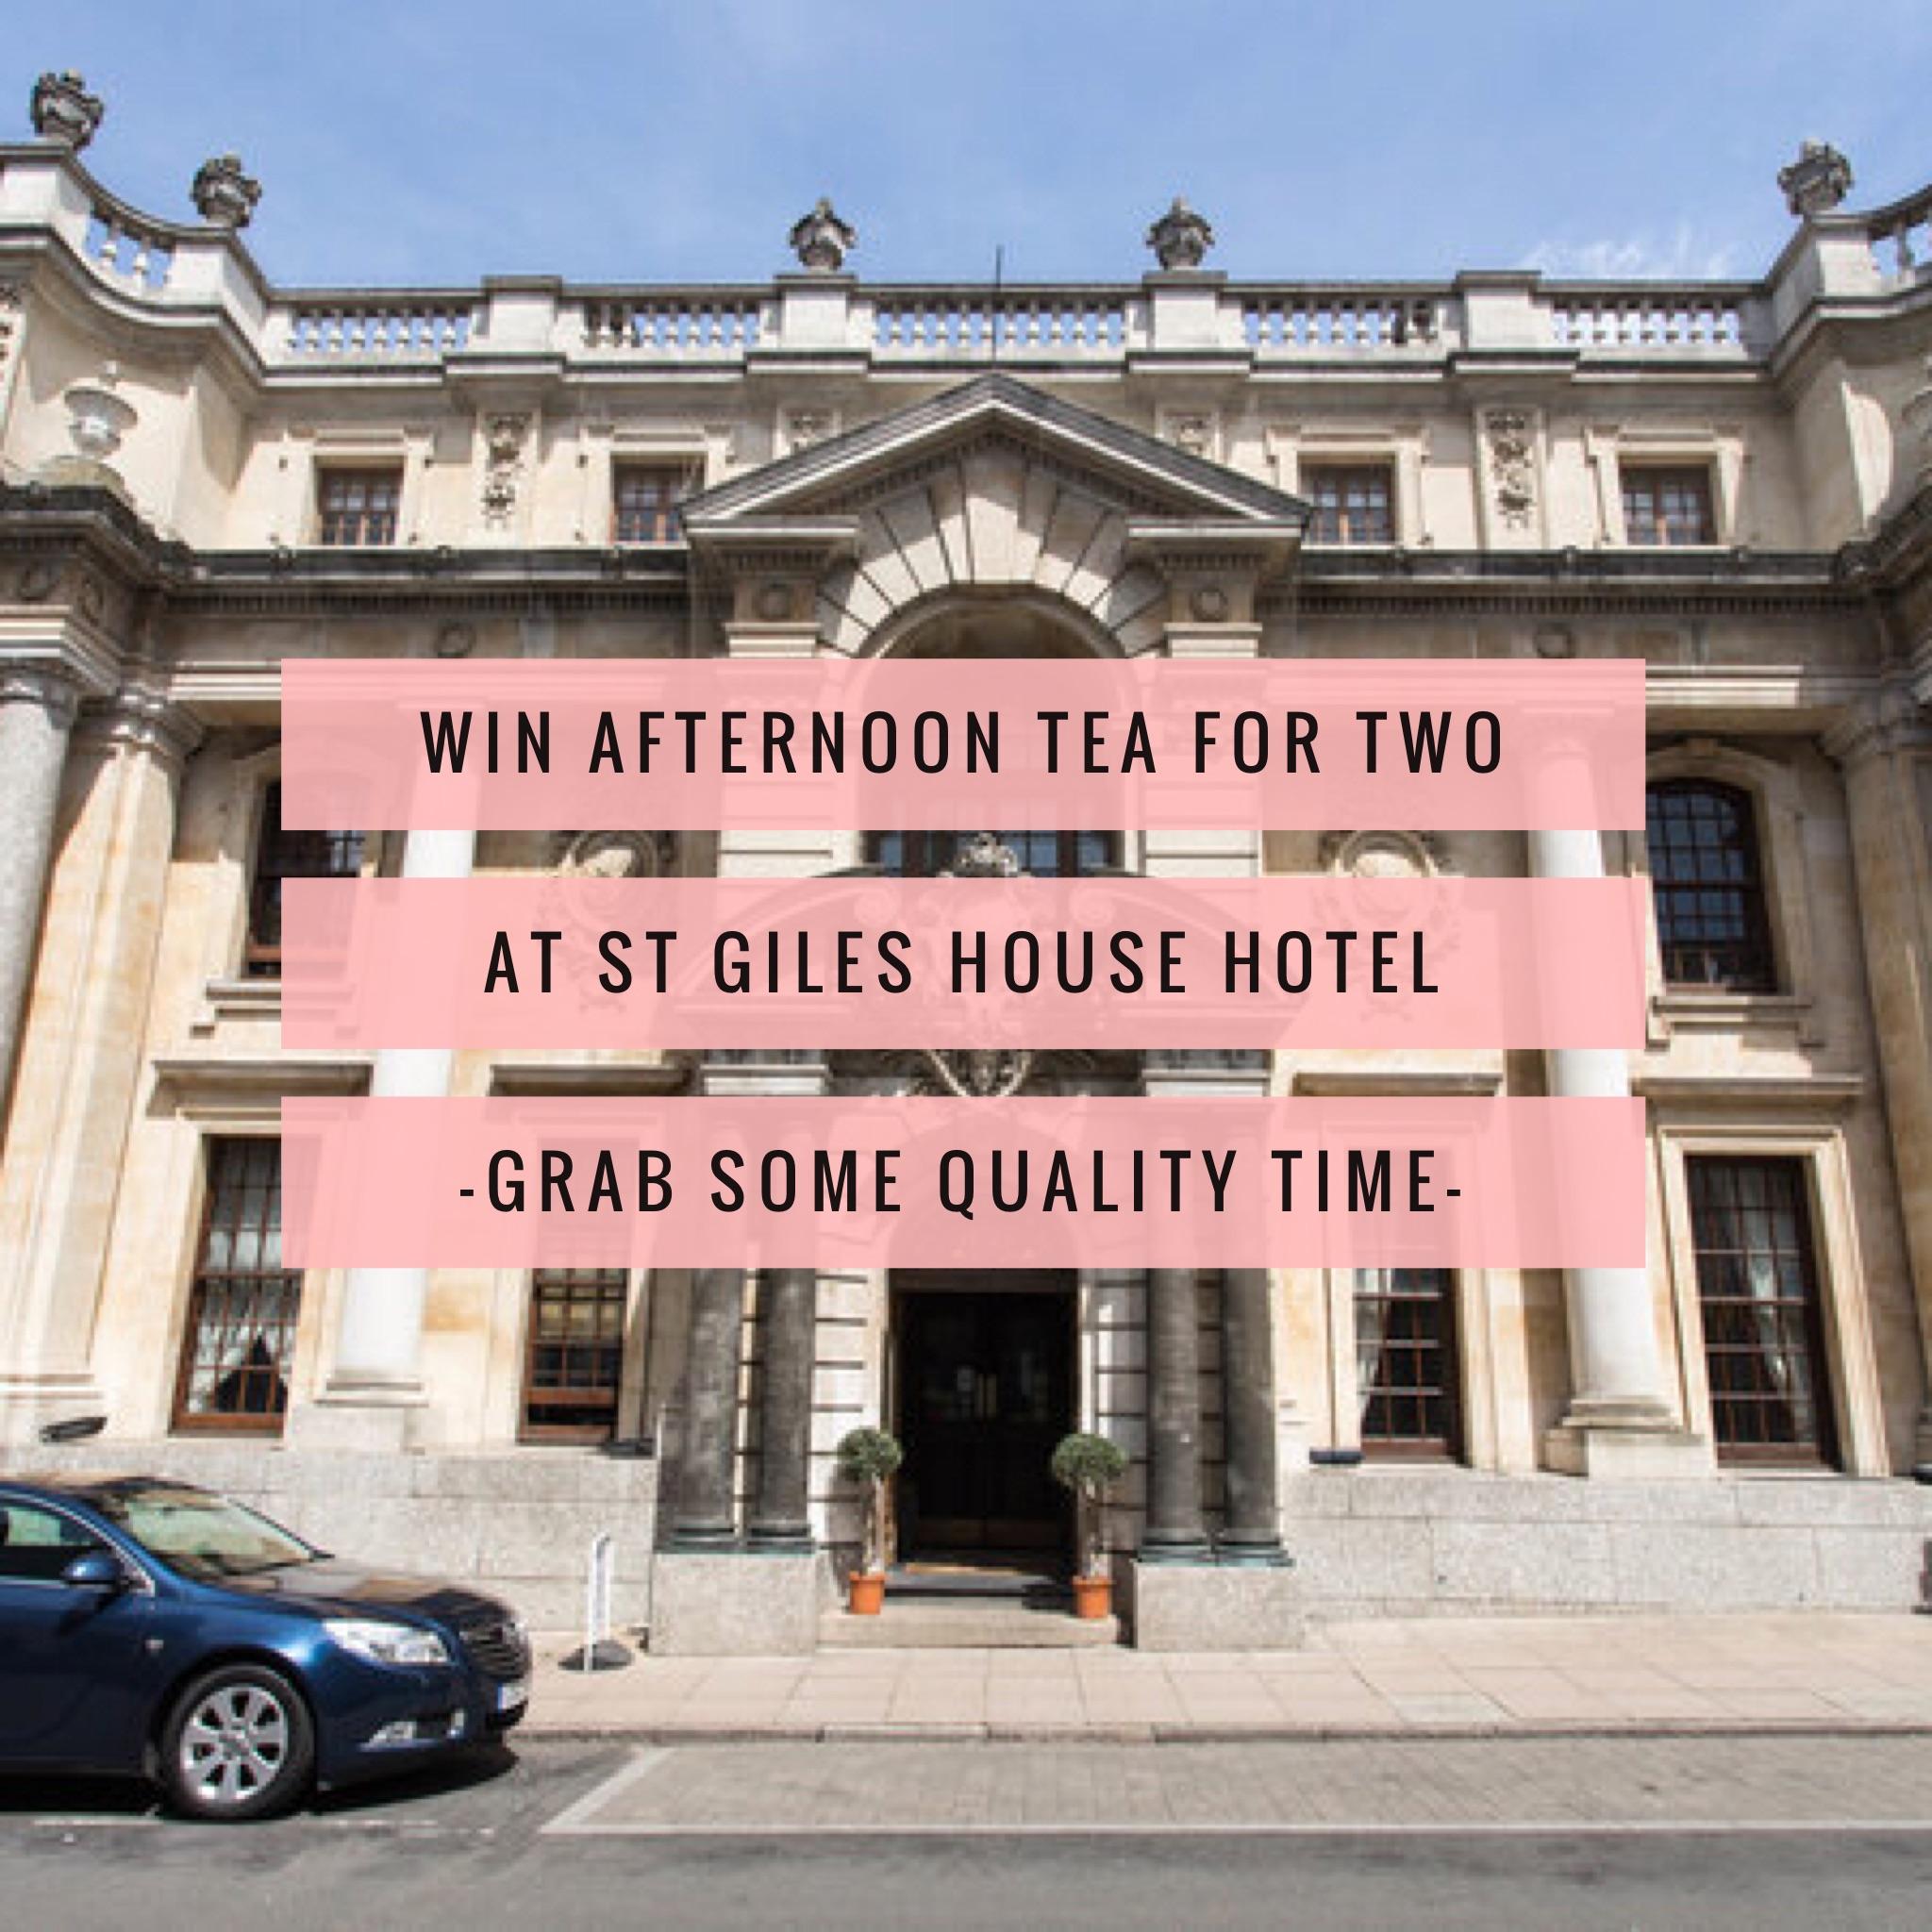 St Giles House Hotel.jpg